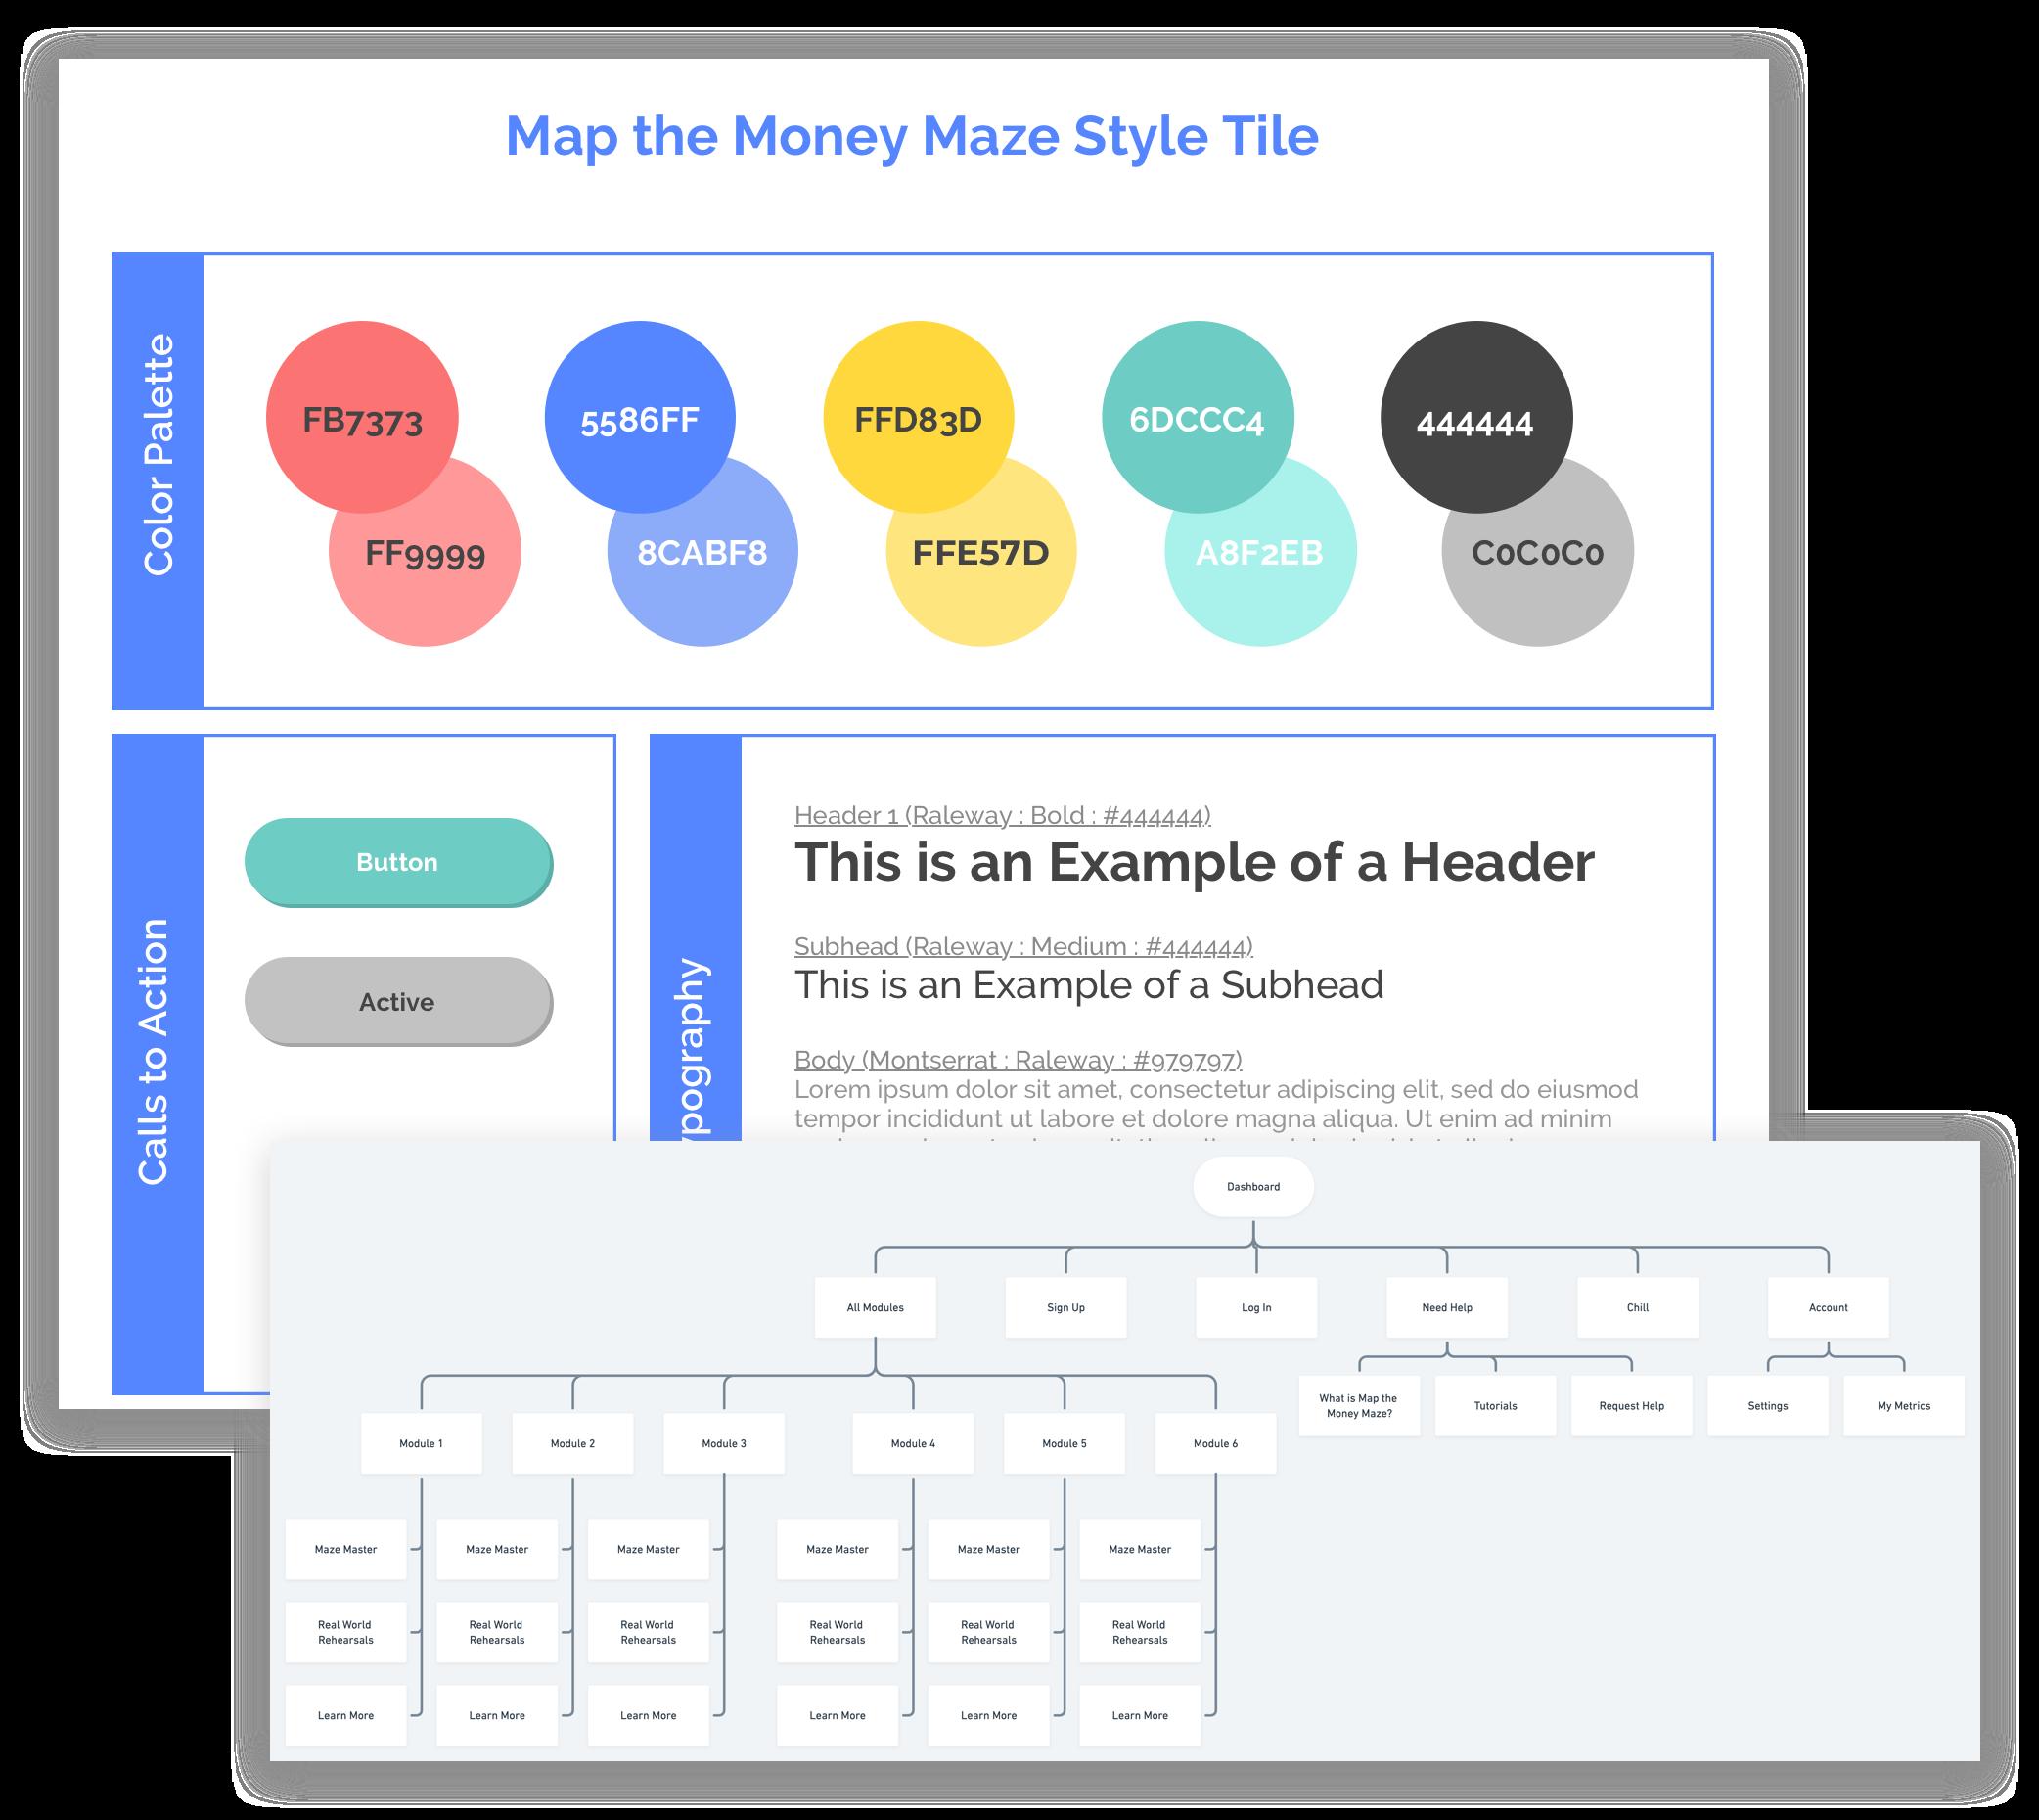 Map the Money Maze